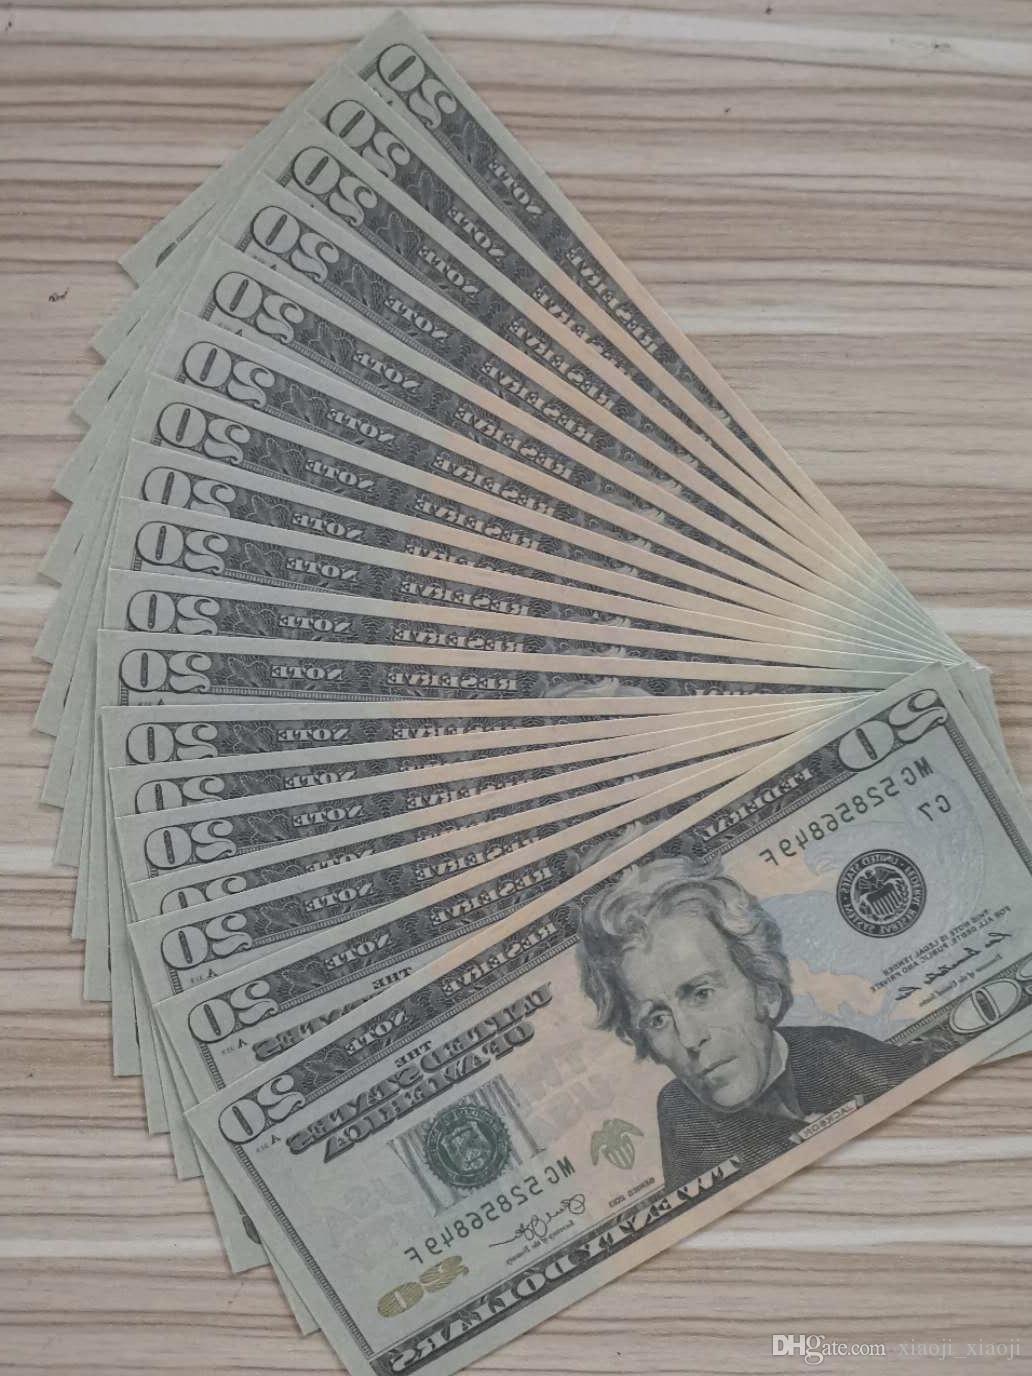 Money Fake Decoration Quality Dollor Dollor Fake 20 Home Wholesale Prop Movie Movie Niños Video para contar película 001 Money Best FWJBE